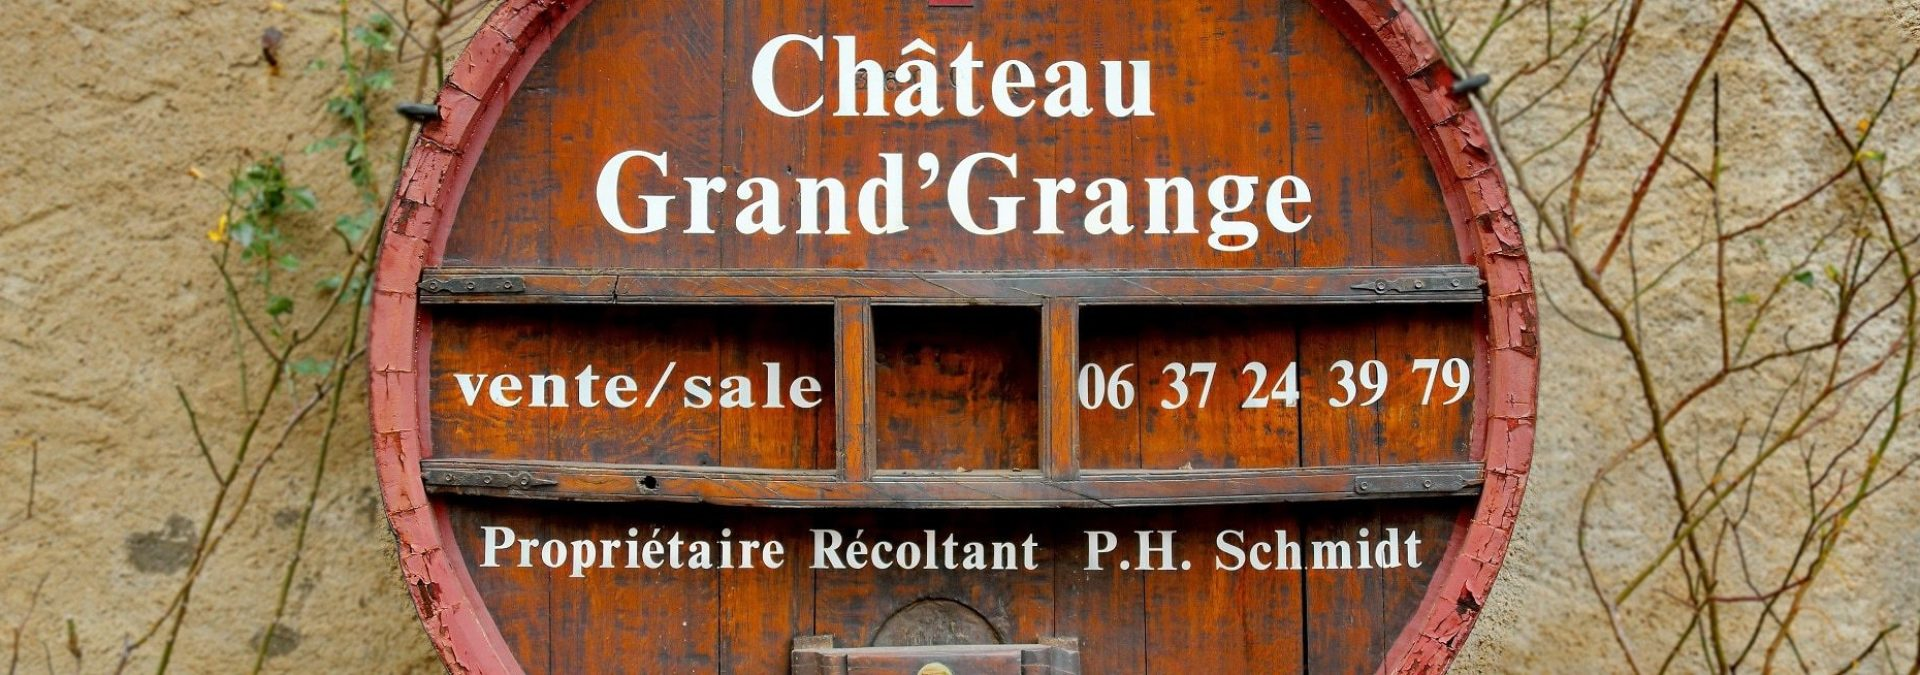 Chateau Grand' Grange